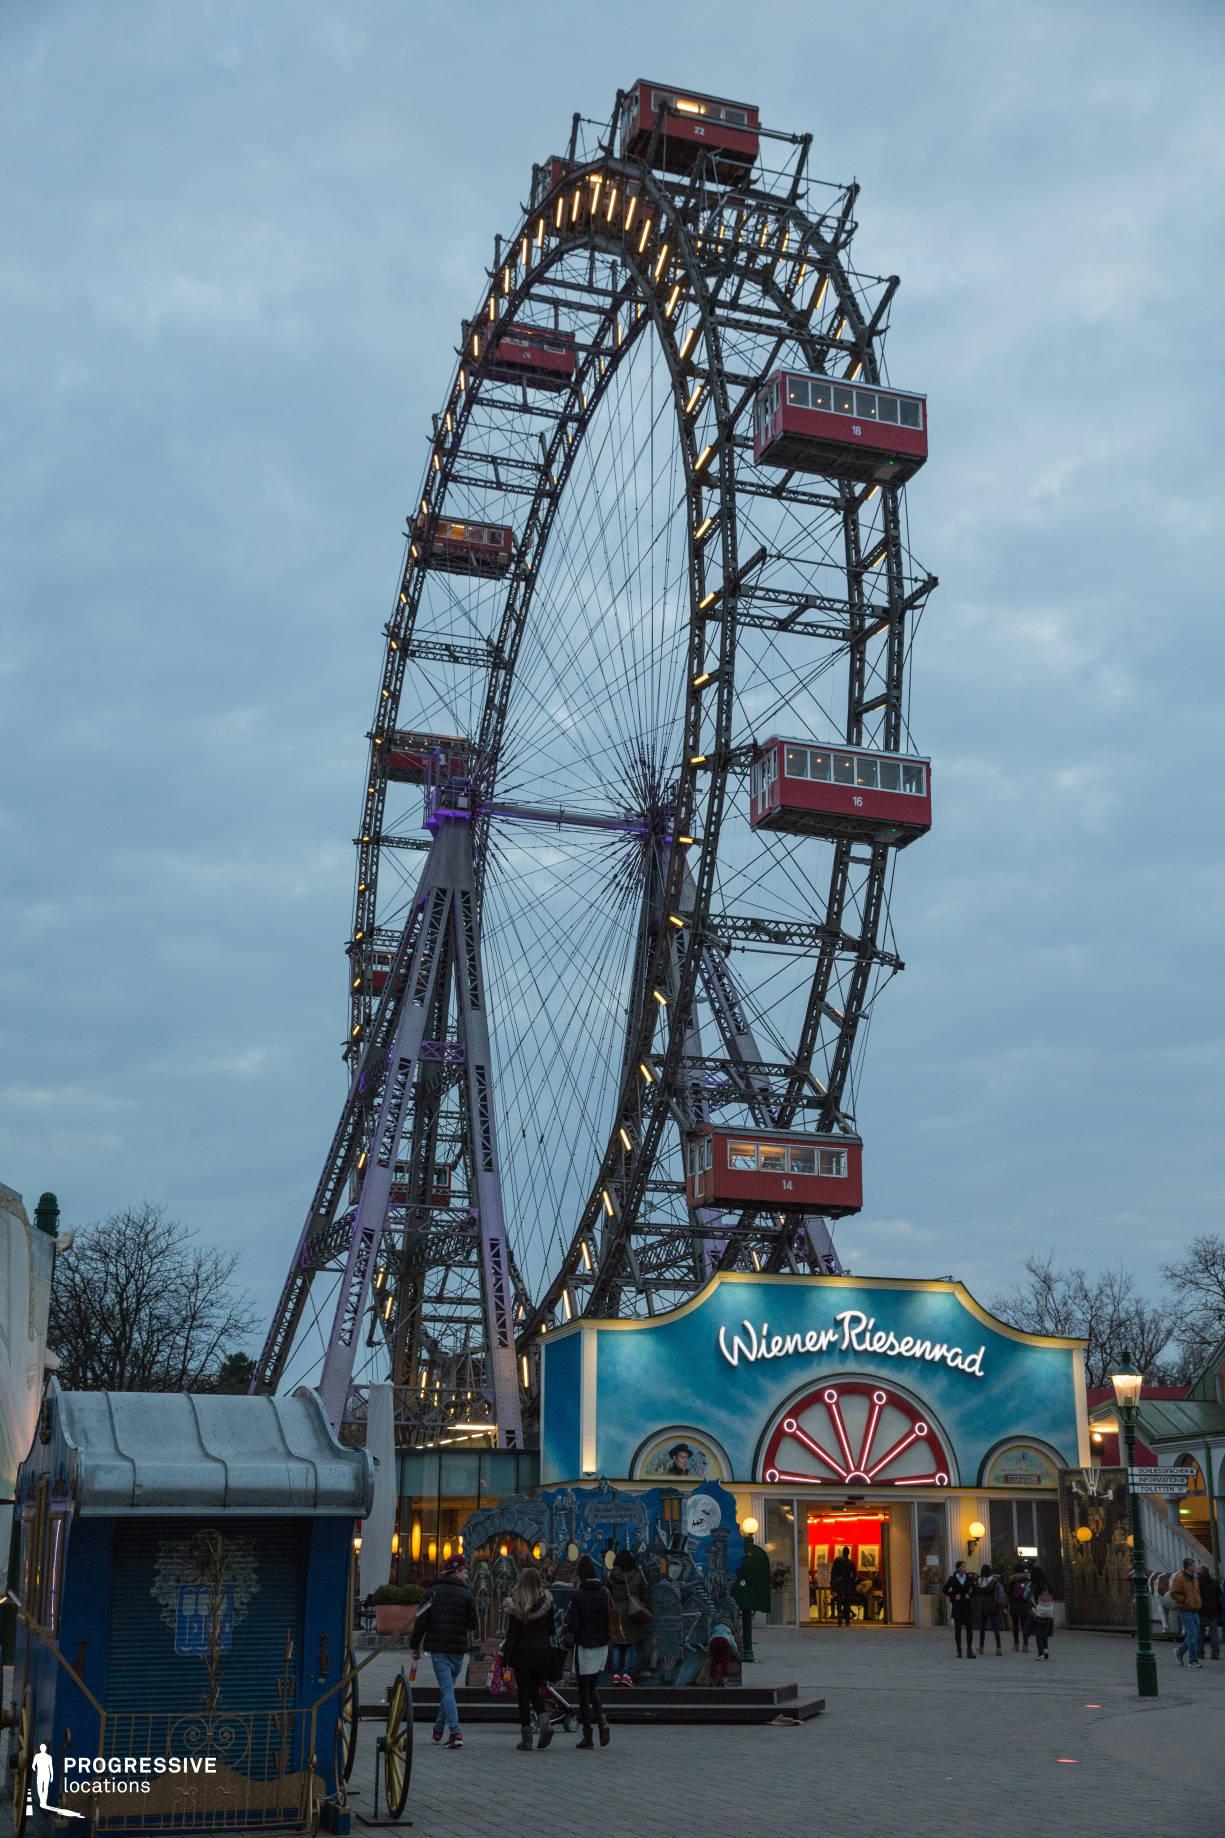 Locations in Austria: Wiener Riesenrad Ferris Wheel, Amusement Park